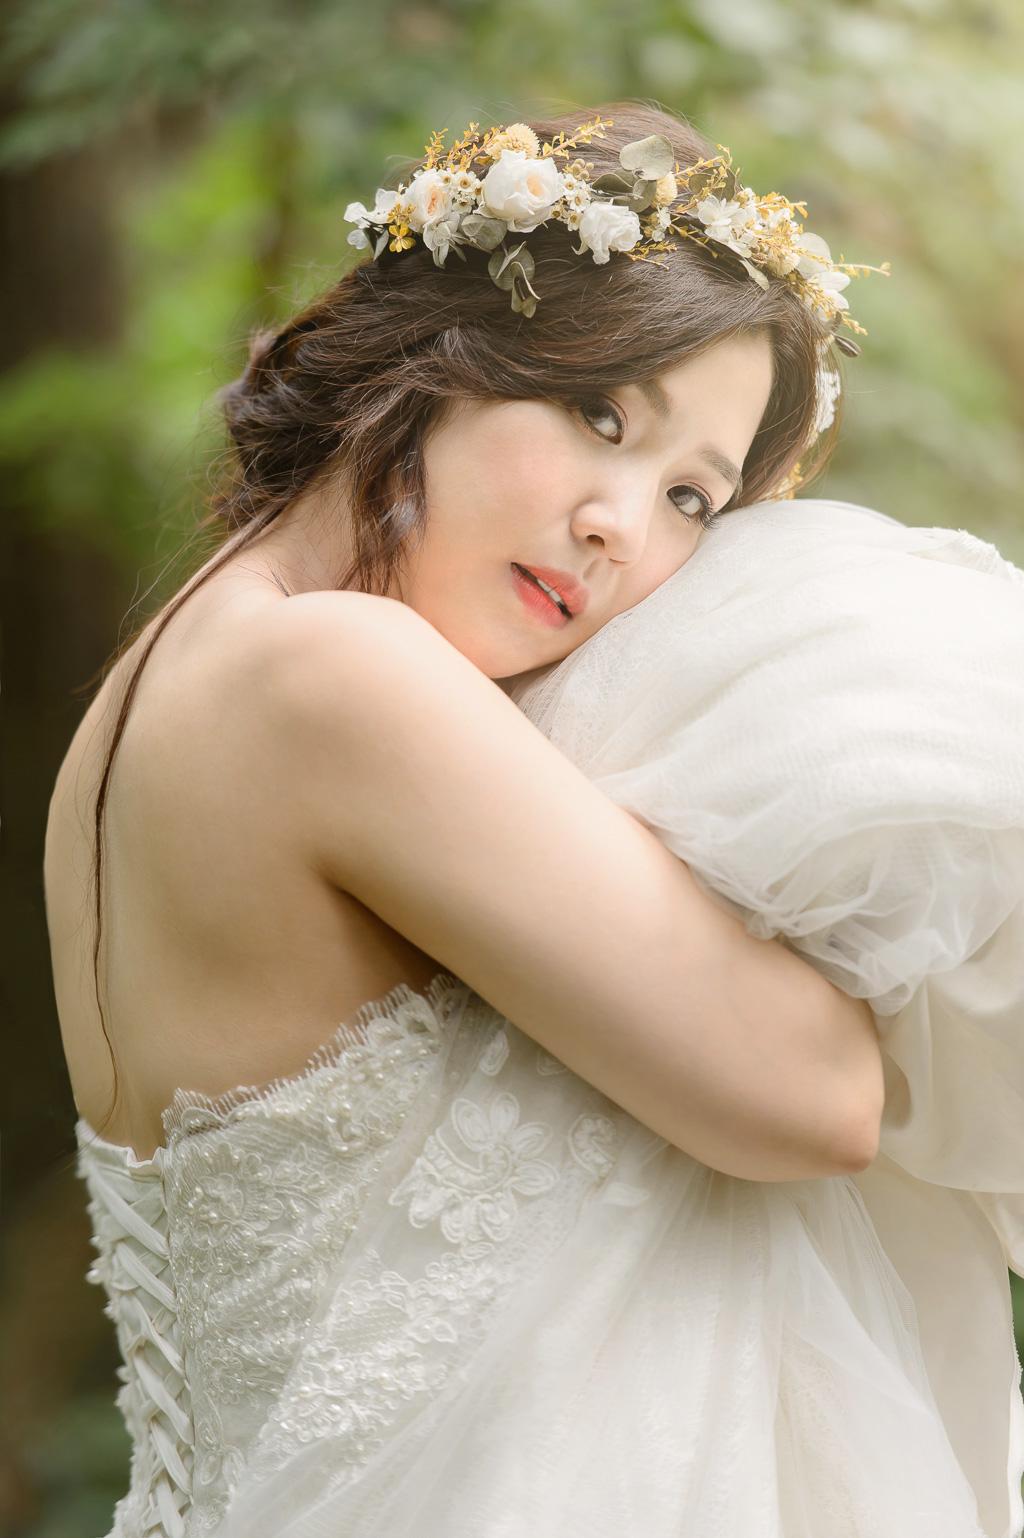 婚攝小勇,小寶團隊, 自助婚紗, even more,wedding day-008